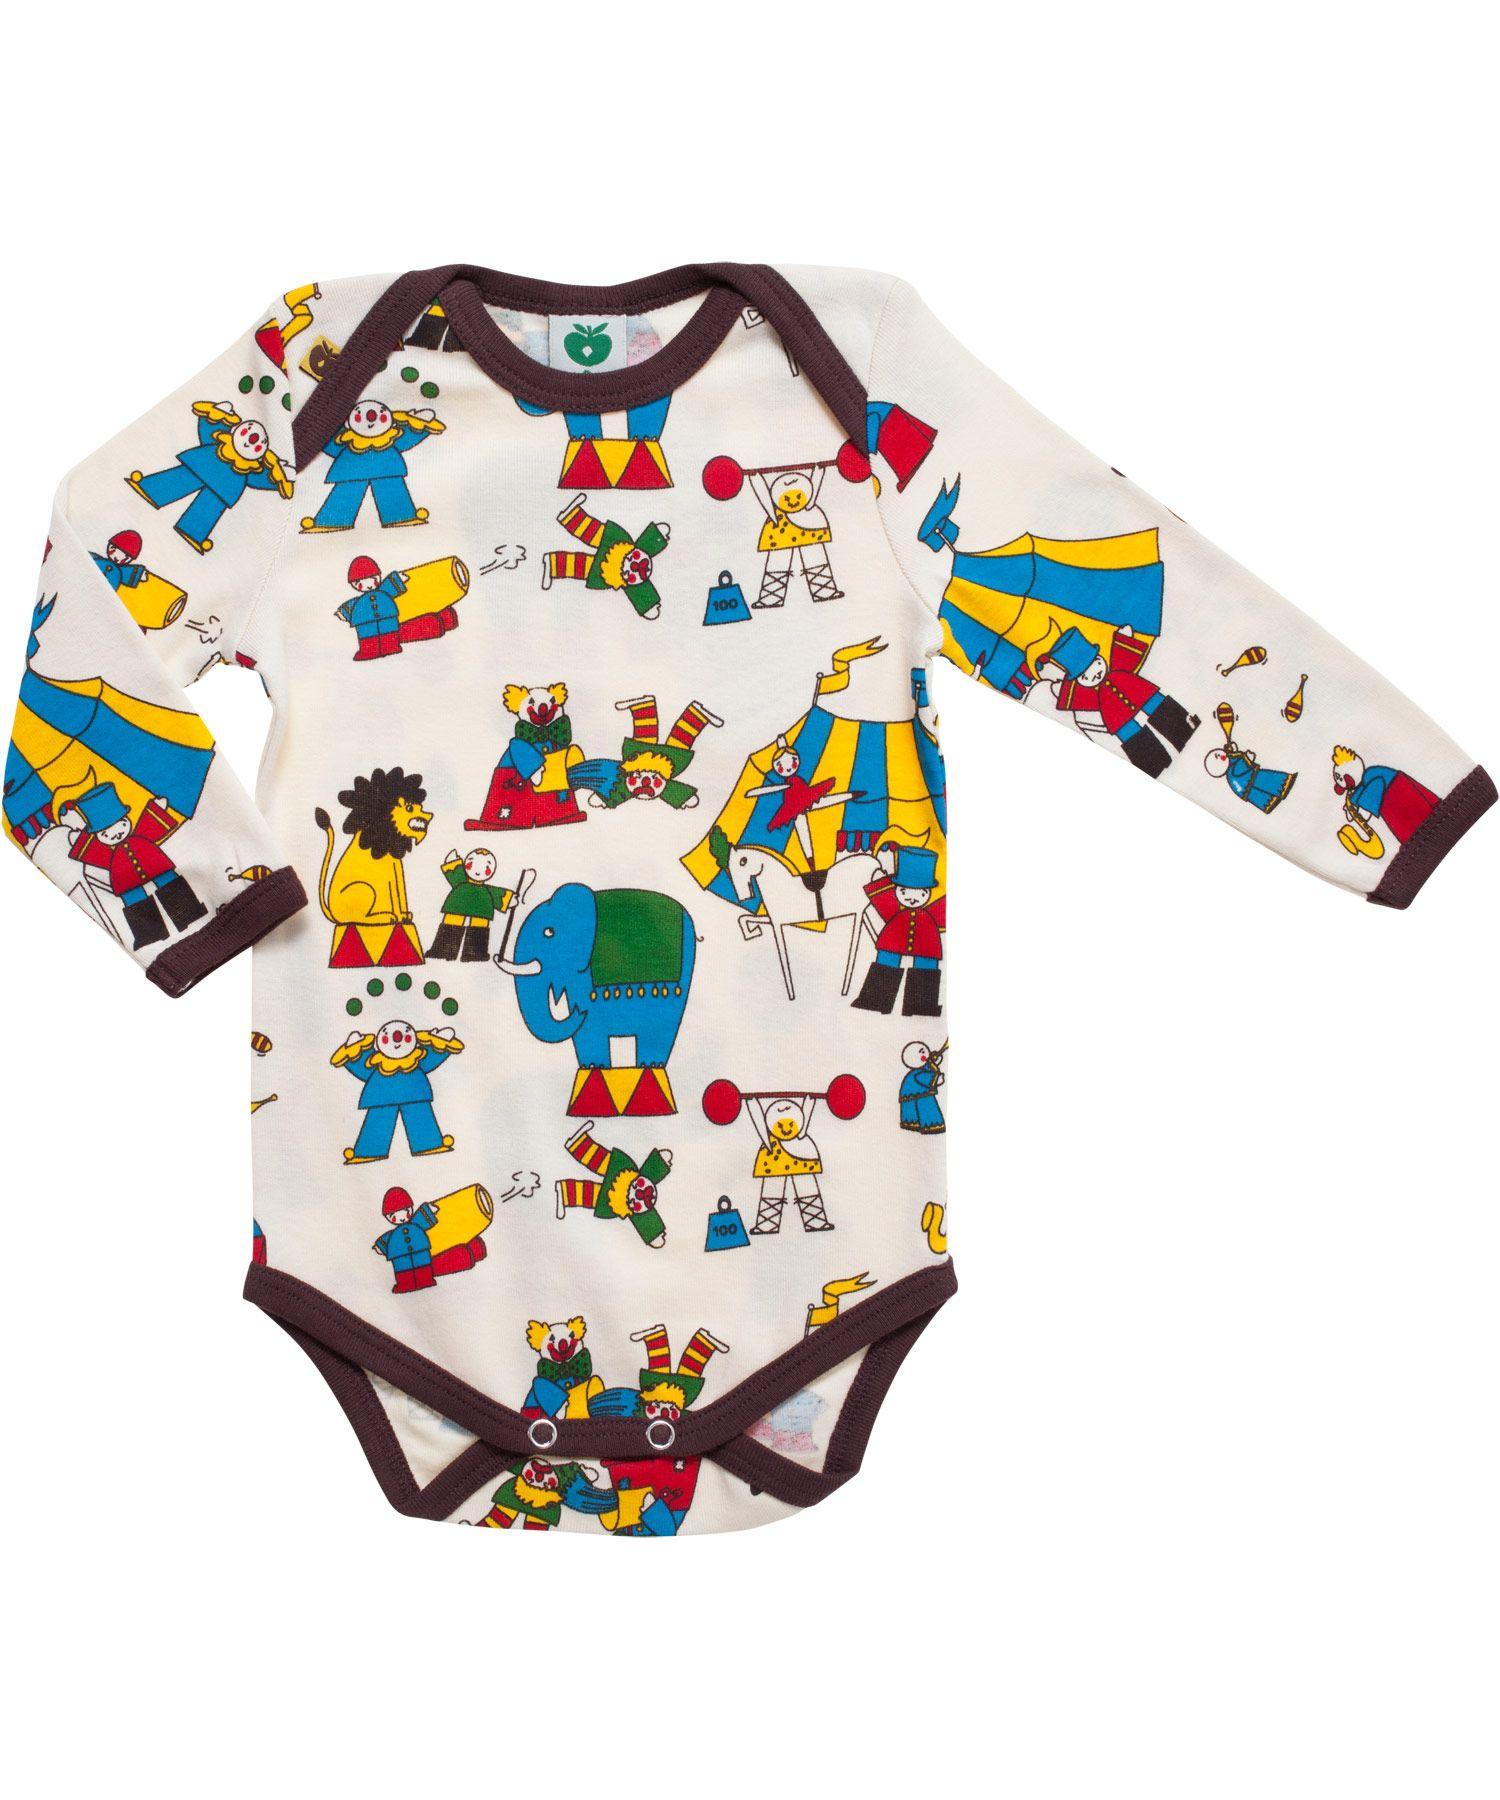 Webwinkel Babykleding.Smafolk Cute Circus Printed Bodystockingbody In 2019 Children